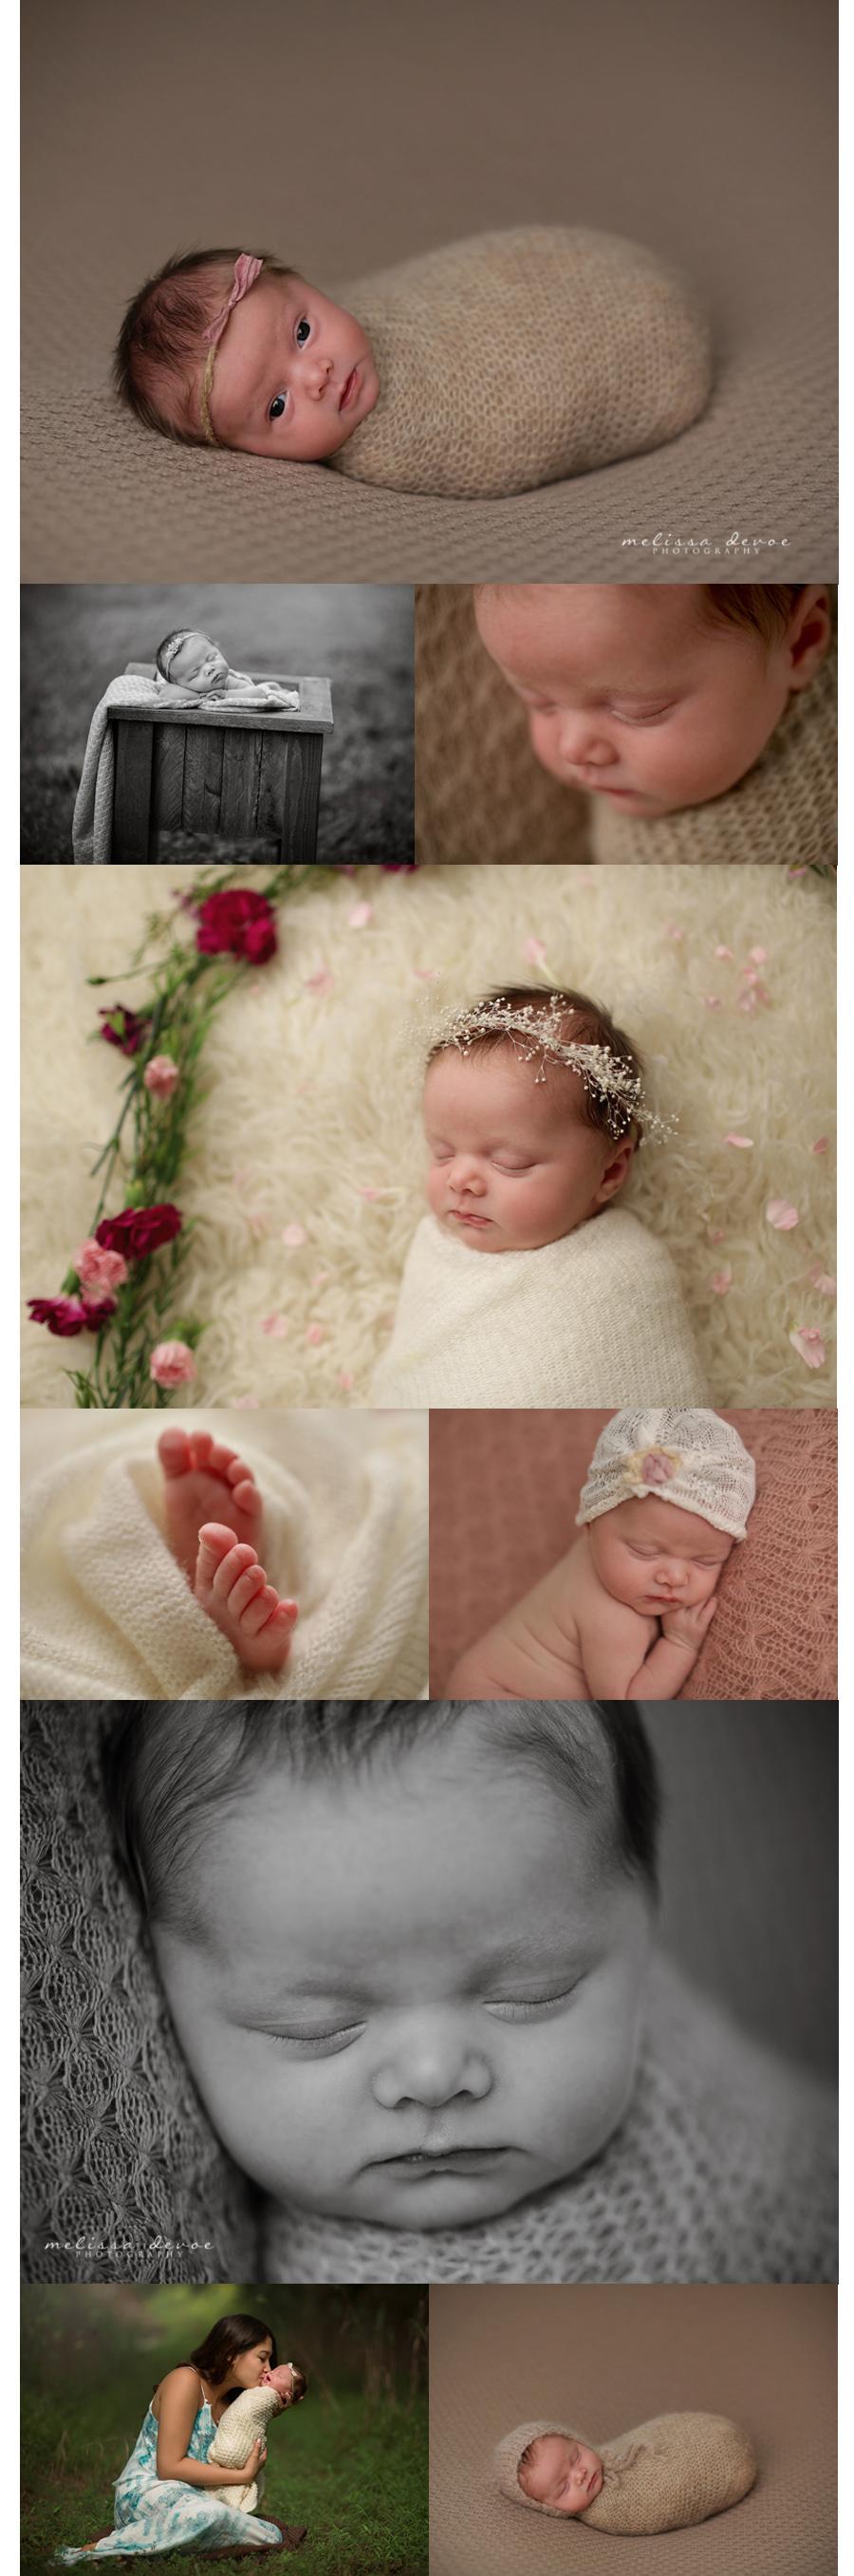 Melissa DeVoe Photography Raleigh NC Newborn Baby Photographer 2